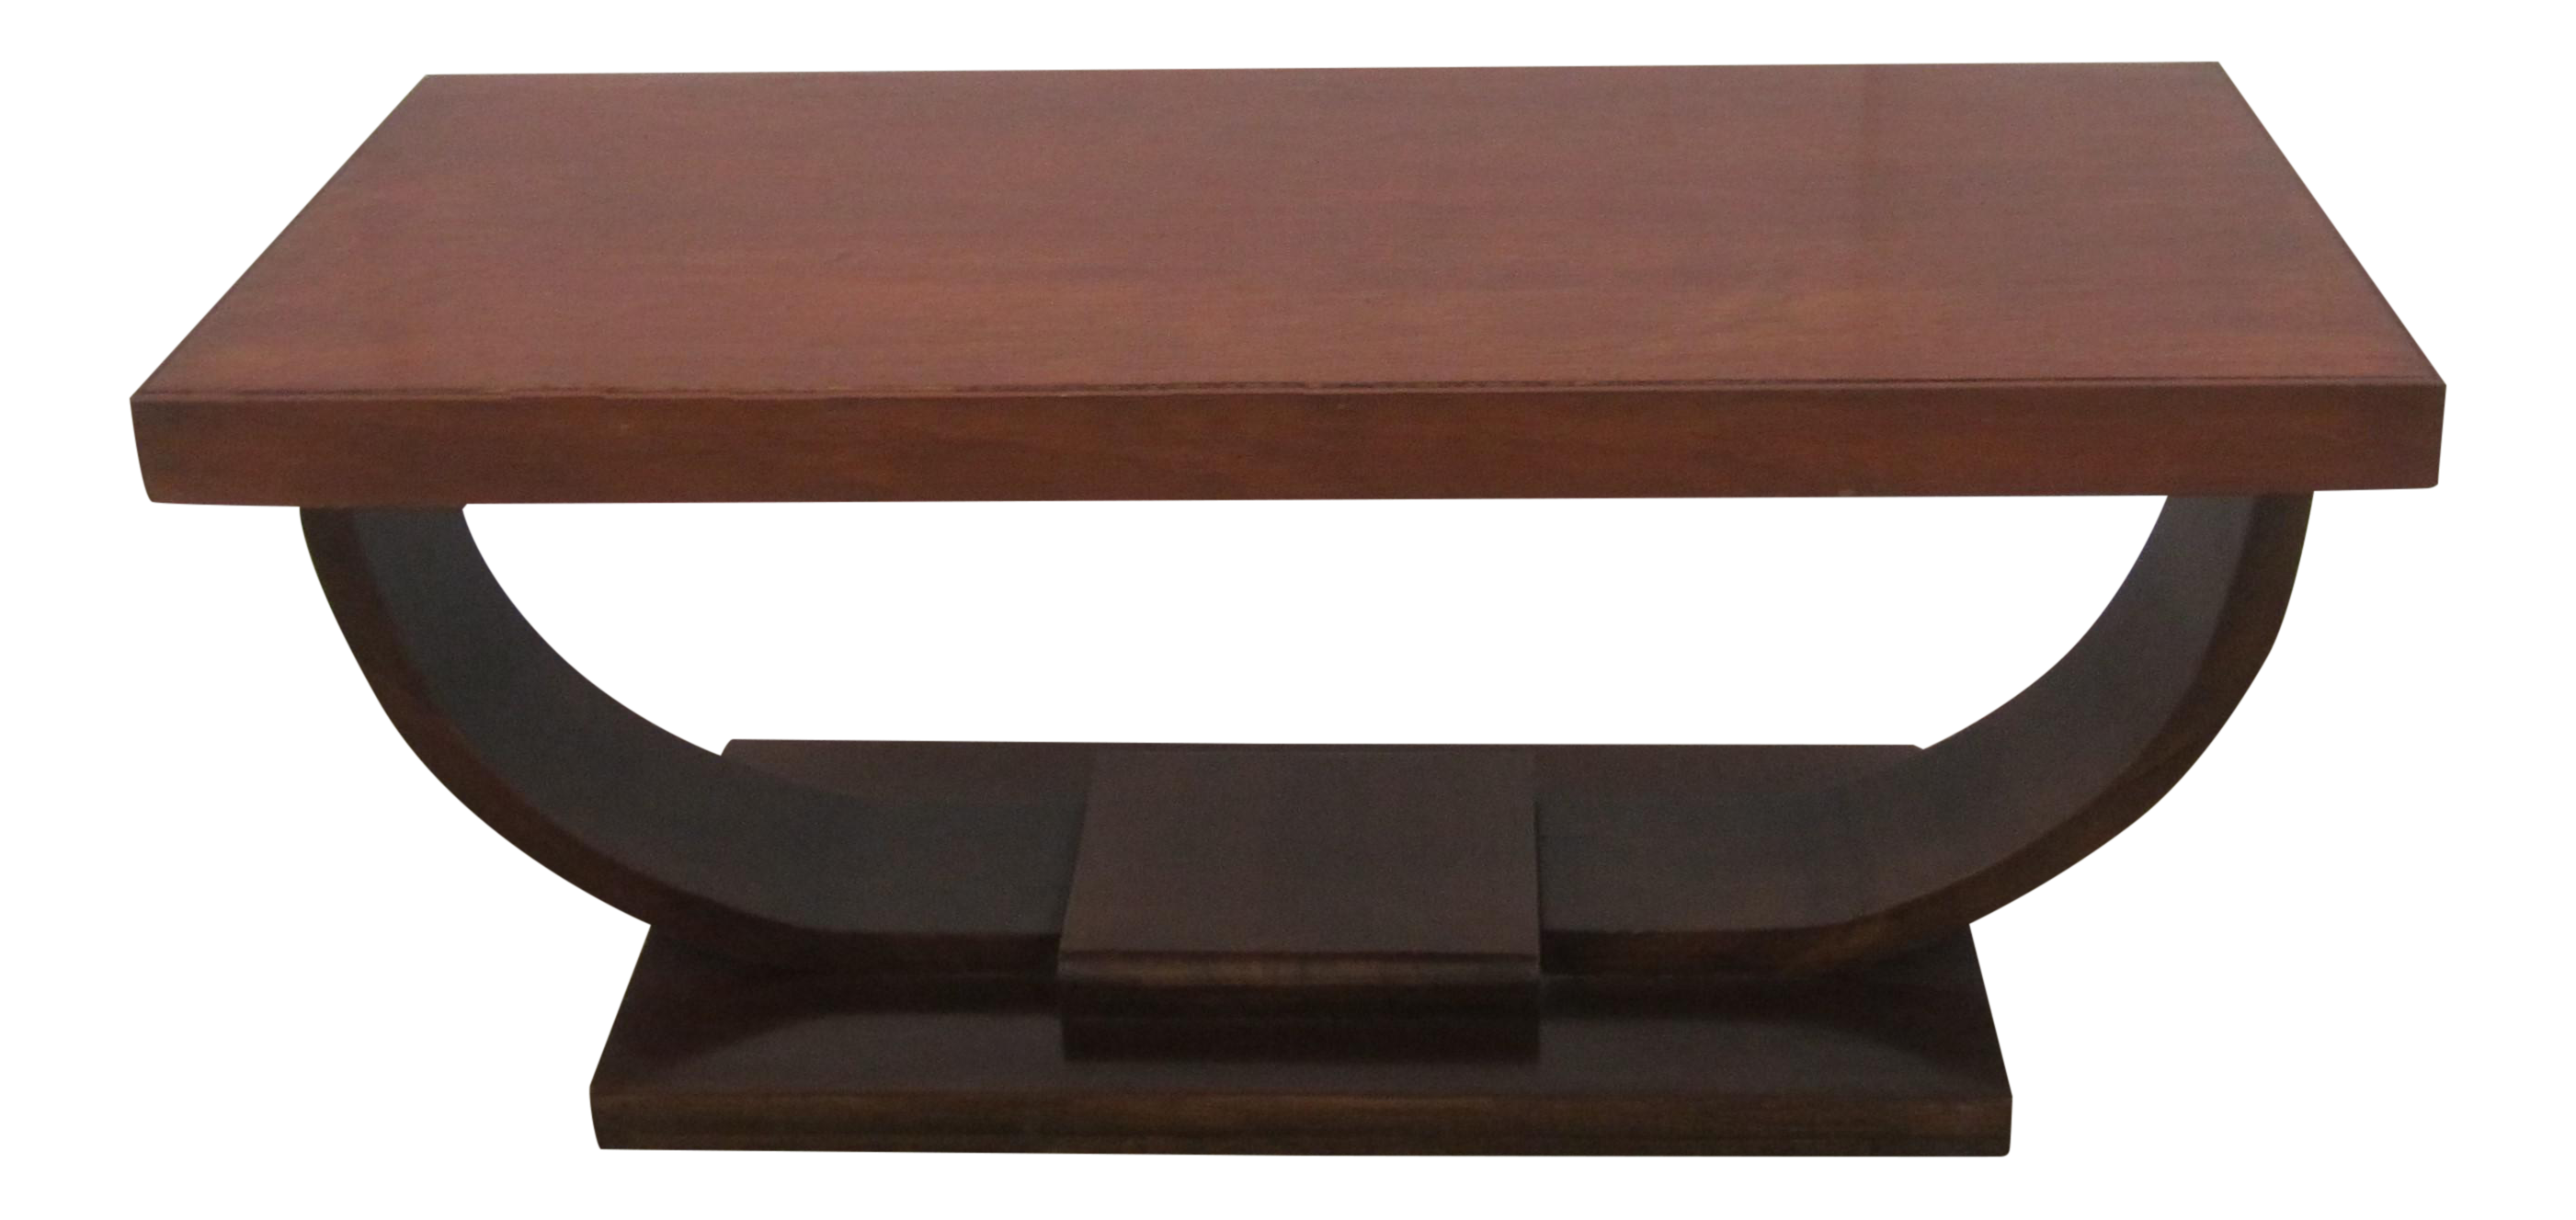 1940s Art Deco Coffee Table